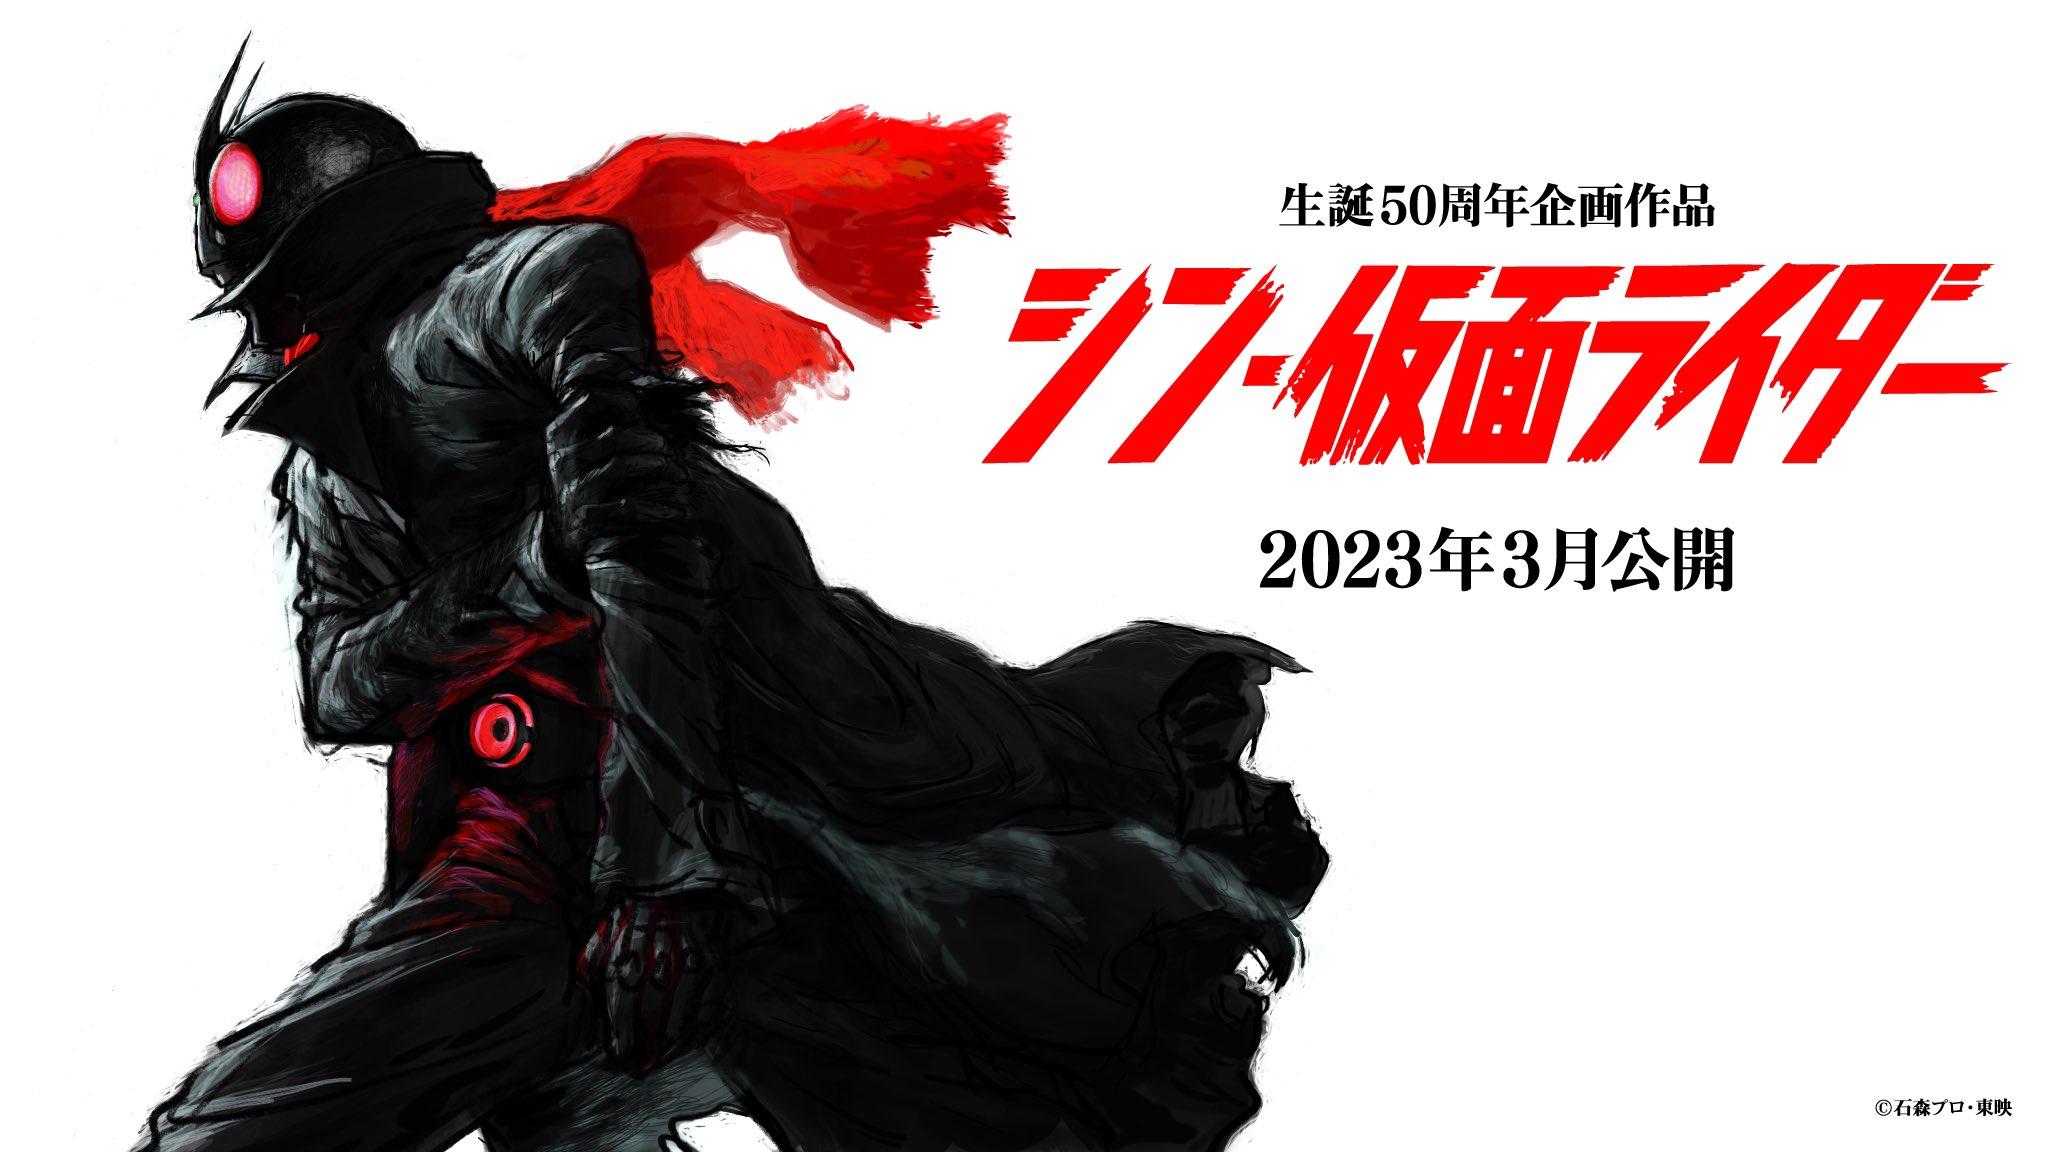 Shin Kamen Rider Teaser Image